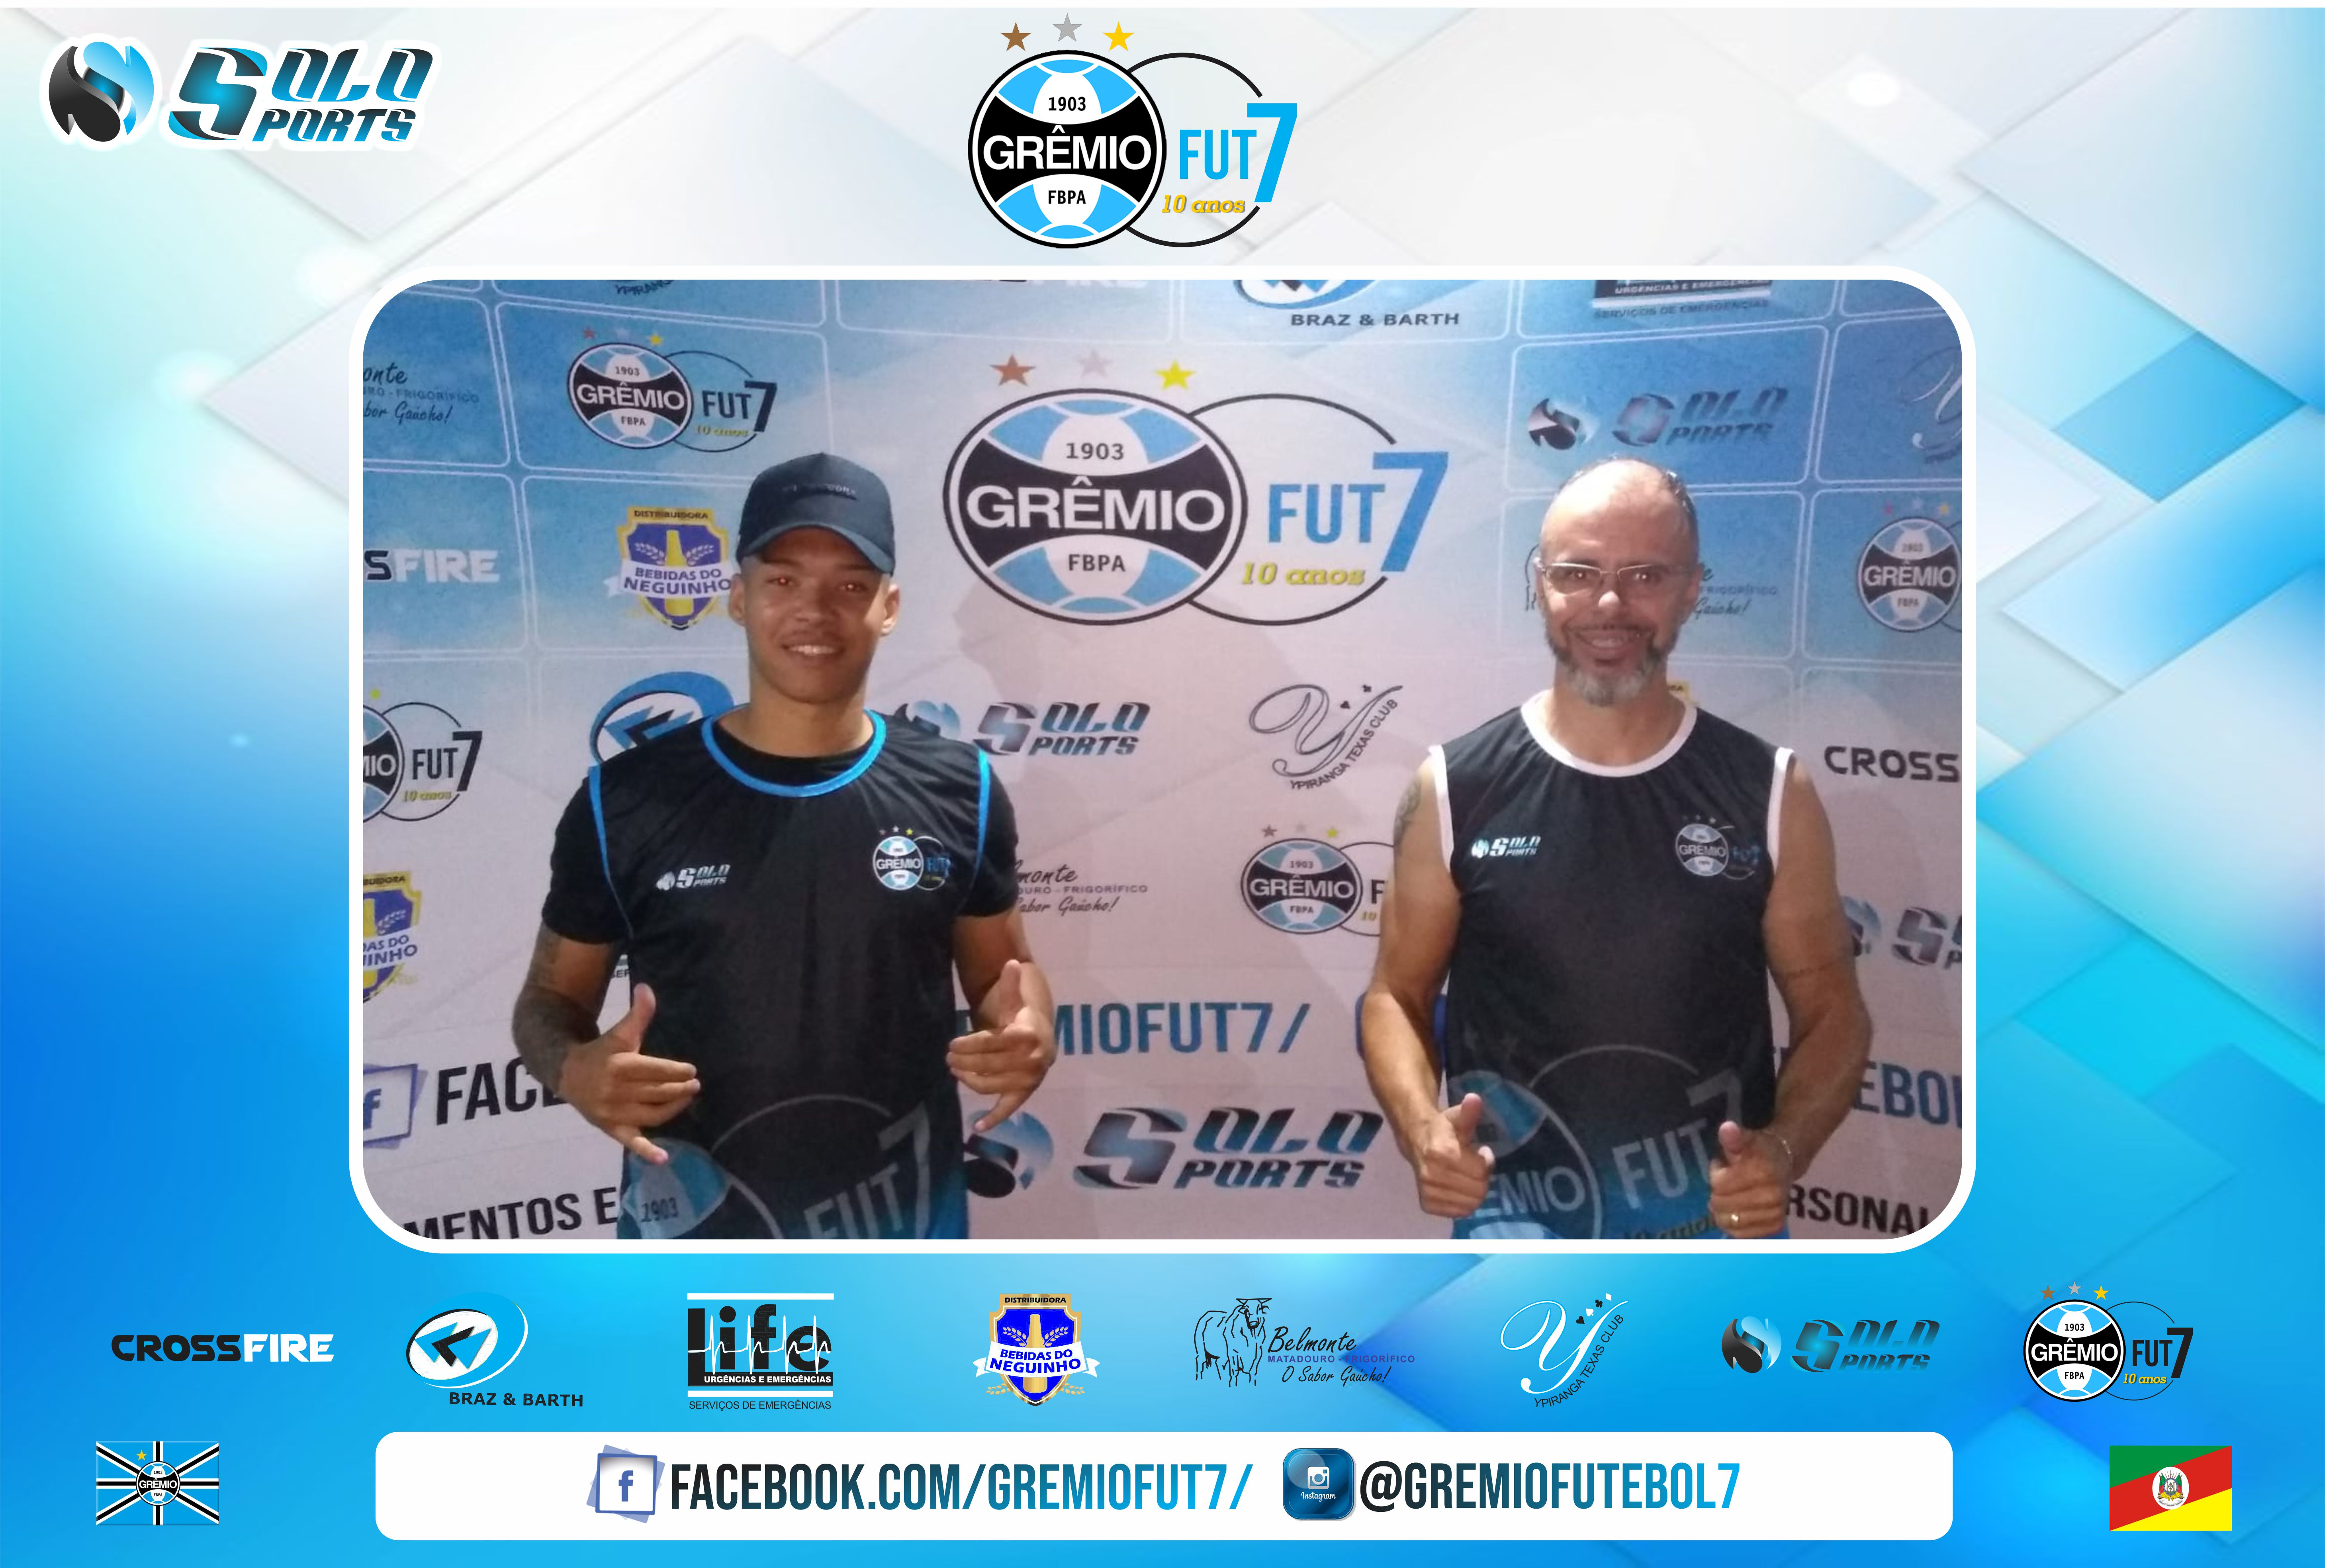 Grêmio Fut7 - 2